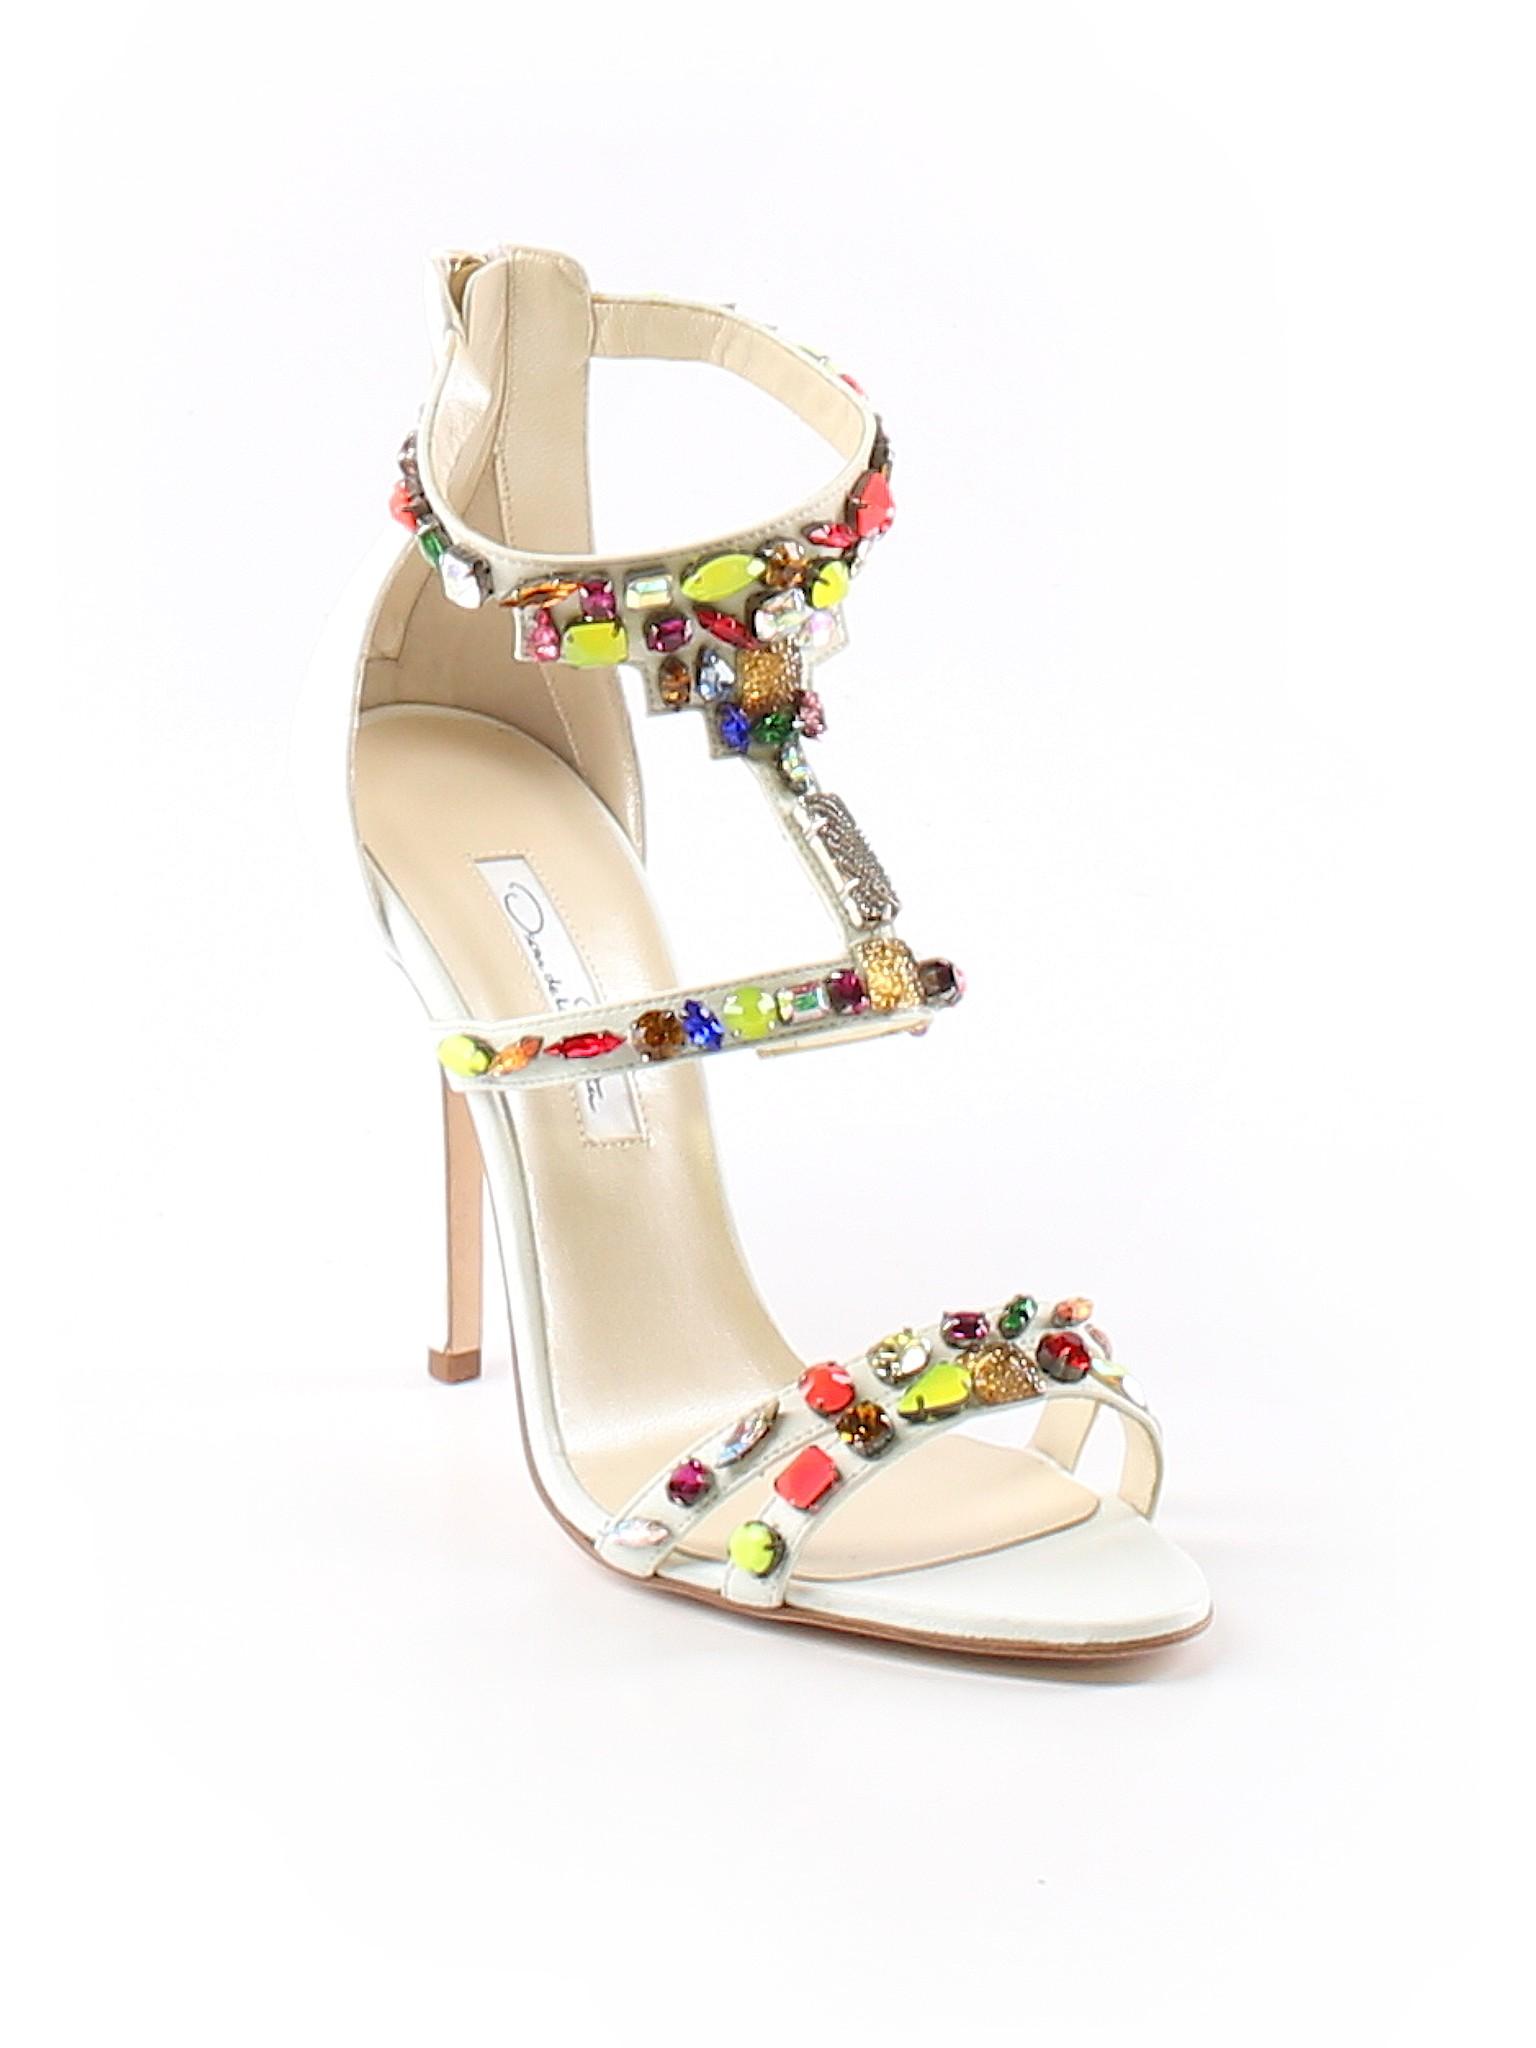 promotion heels Simona Oscar Nappa De Boutique La Ivory Renta 7Bdwxqp